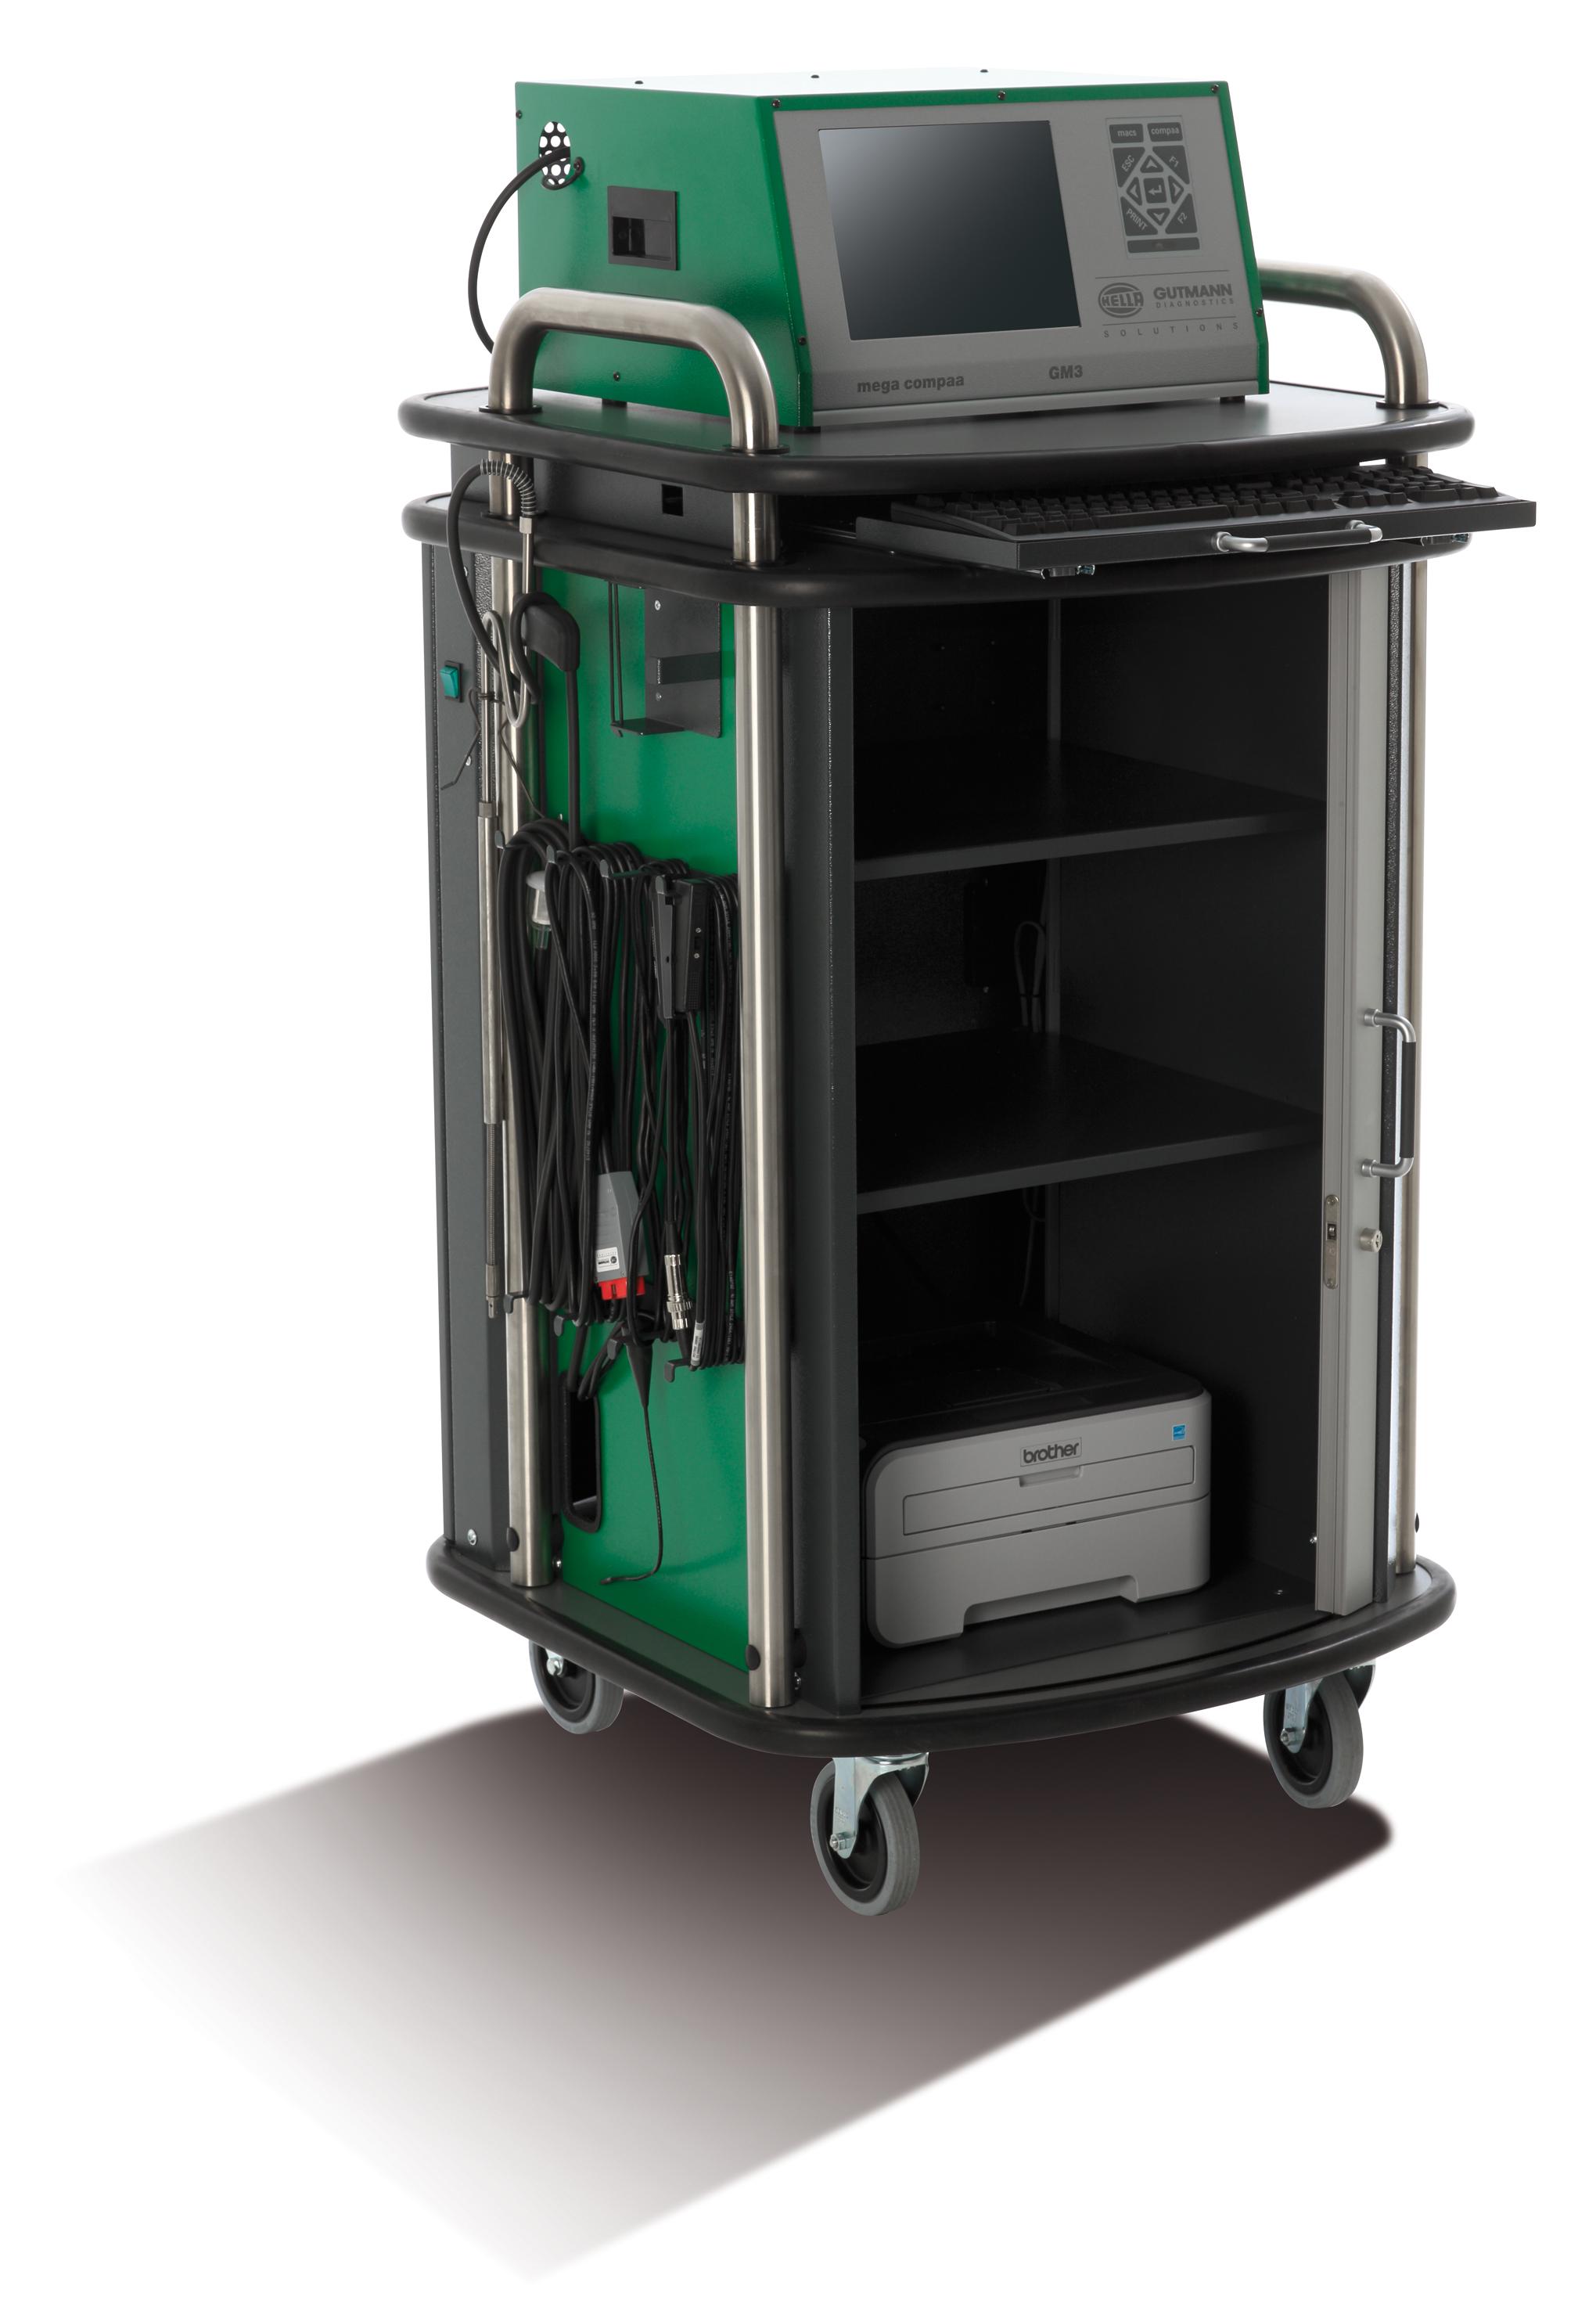 hella gutmann solutions gmbh presse bilder. Black Bedroom Furniture Sets. Home Design Ideas